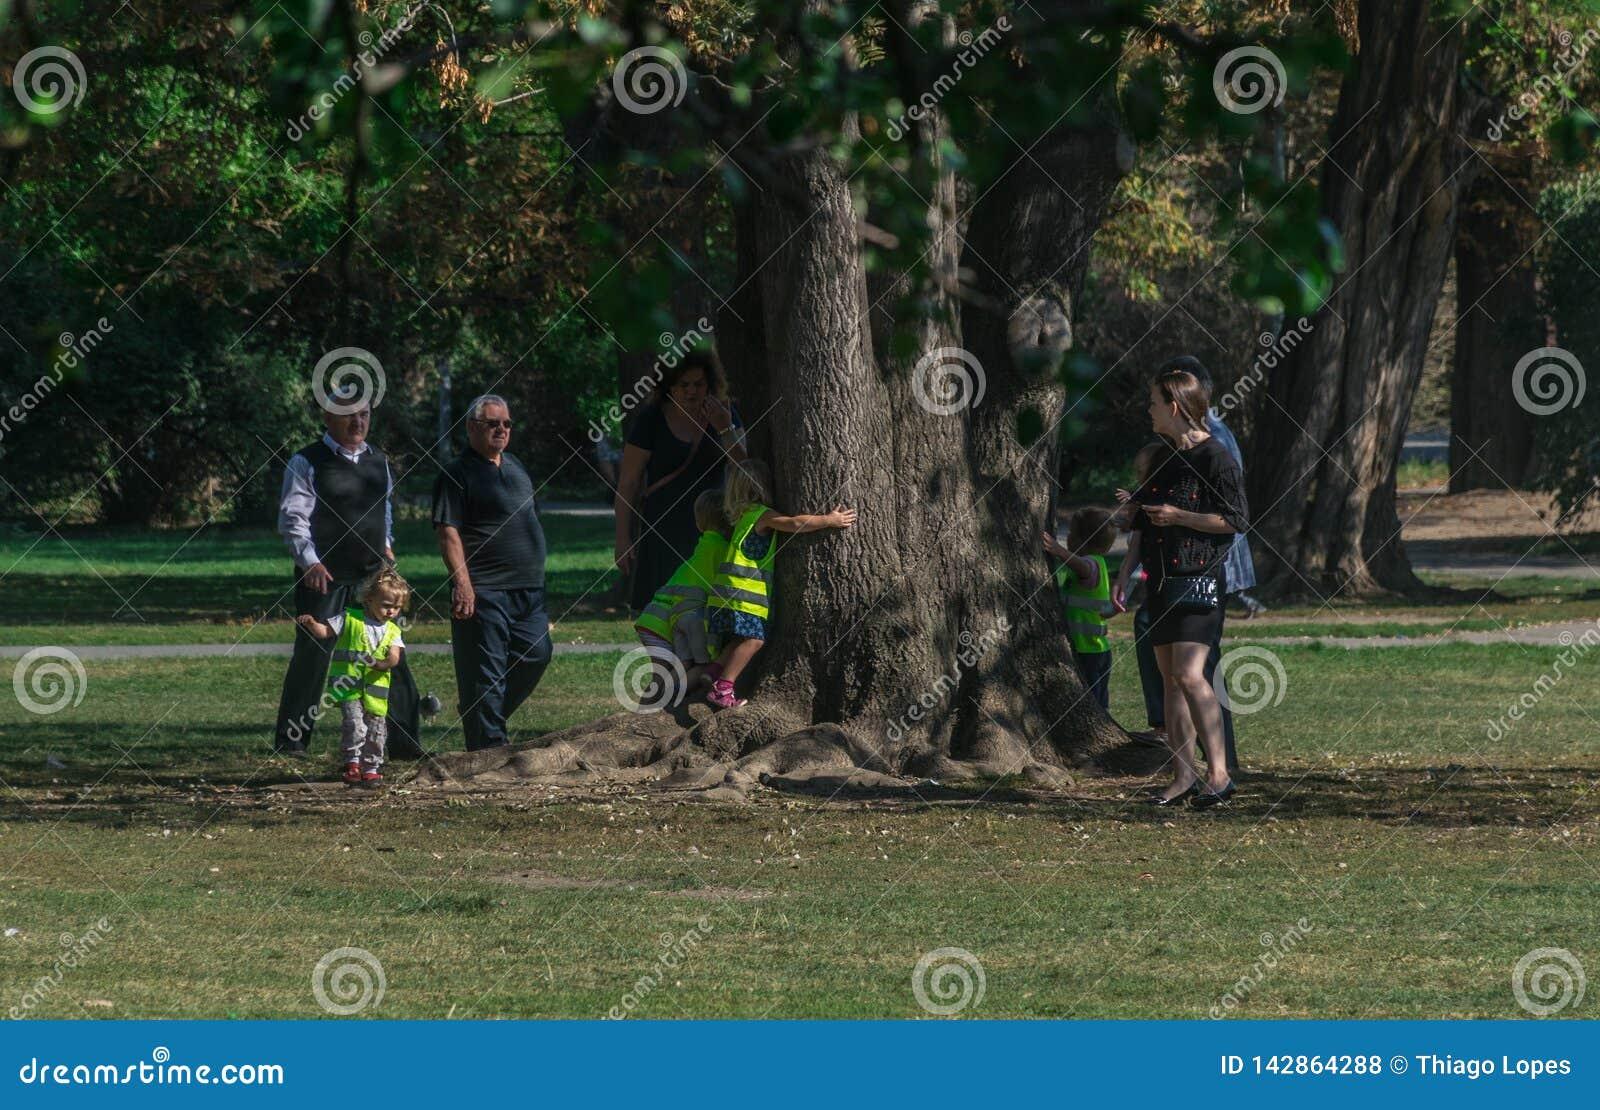 Prague, Czech Republic - September 10, 2019: kids hugging a tree under parents supervision